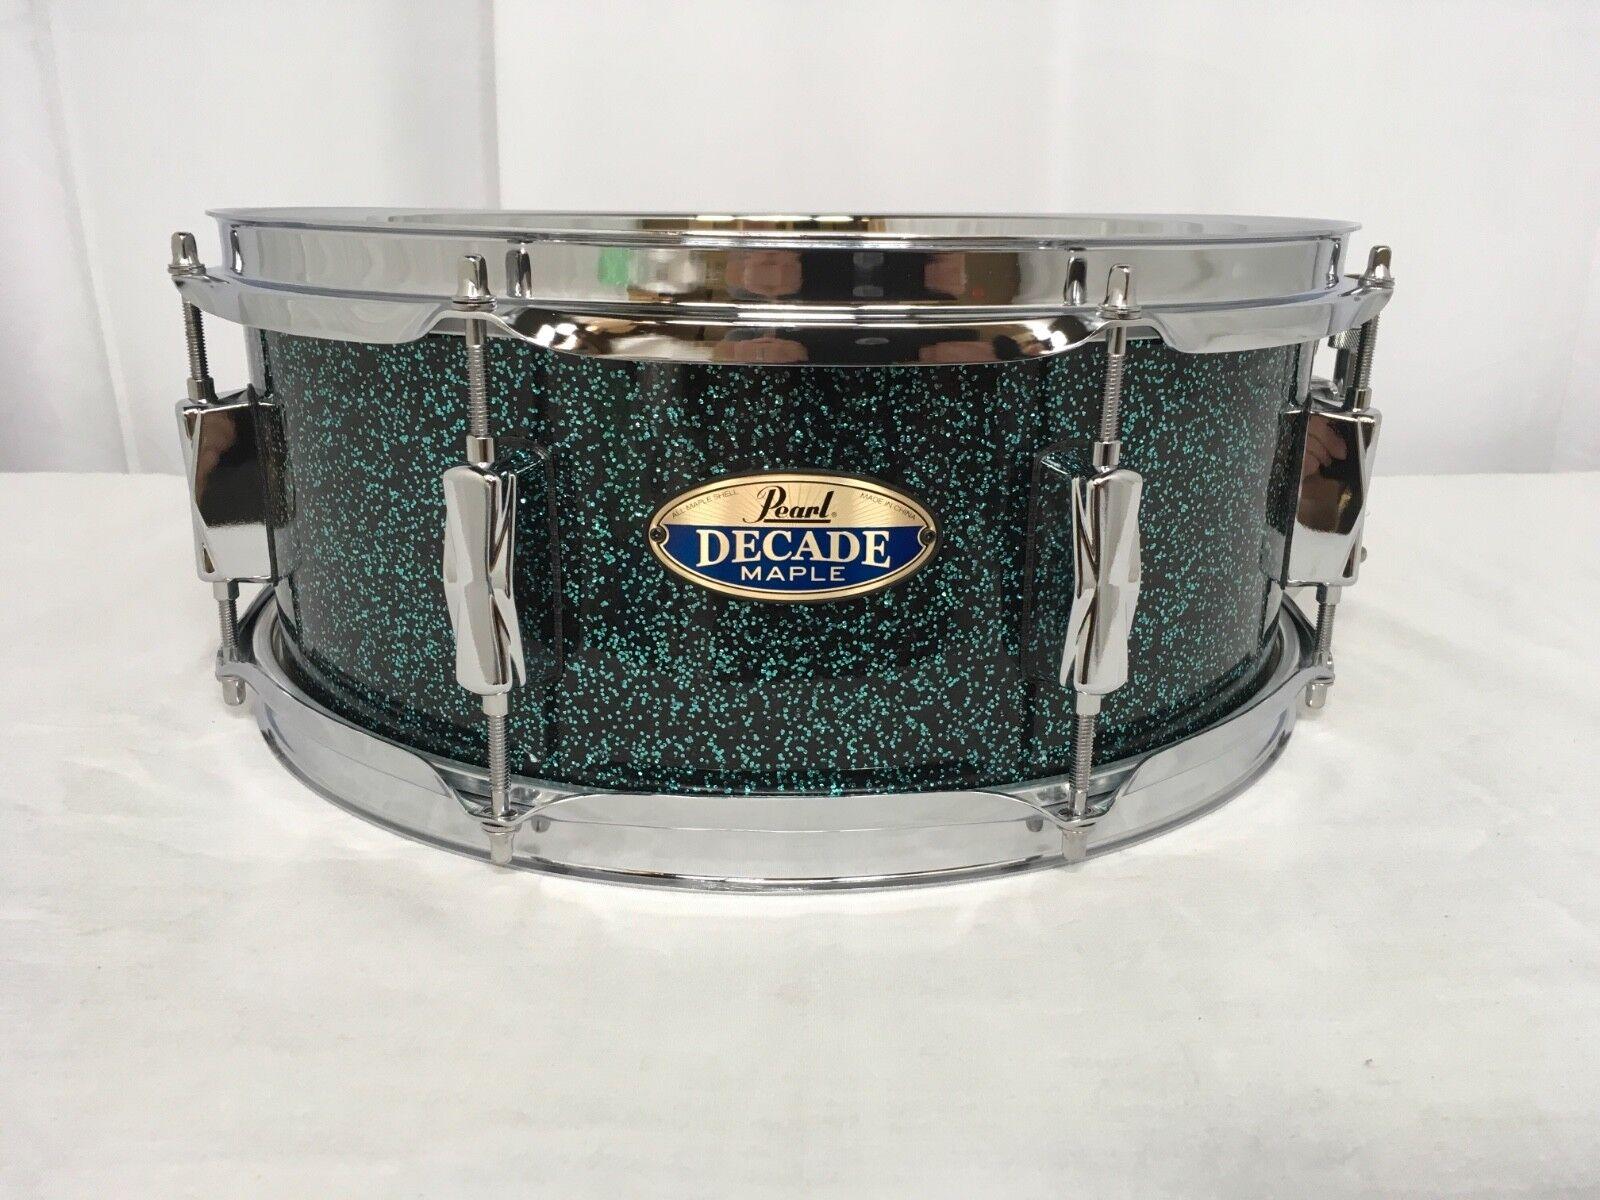 Pearl Decade Maple DMPR 14  Snare Drum Finish  712 Ocean Galaxy Flake Brand New